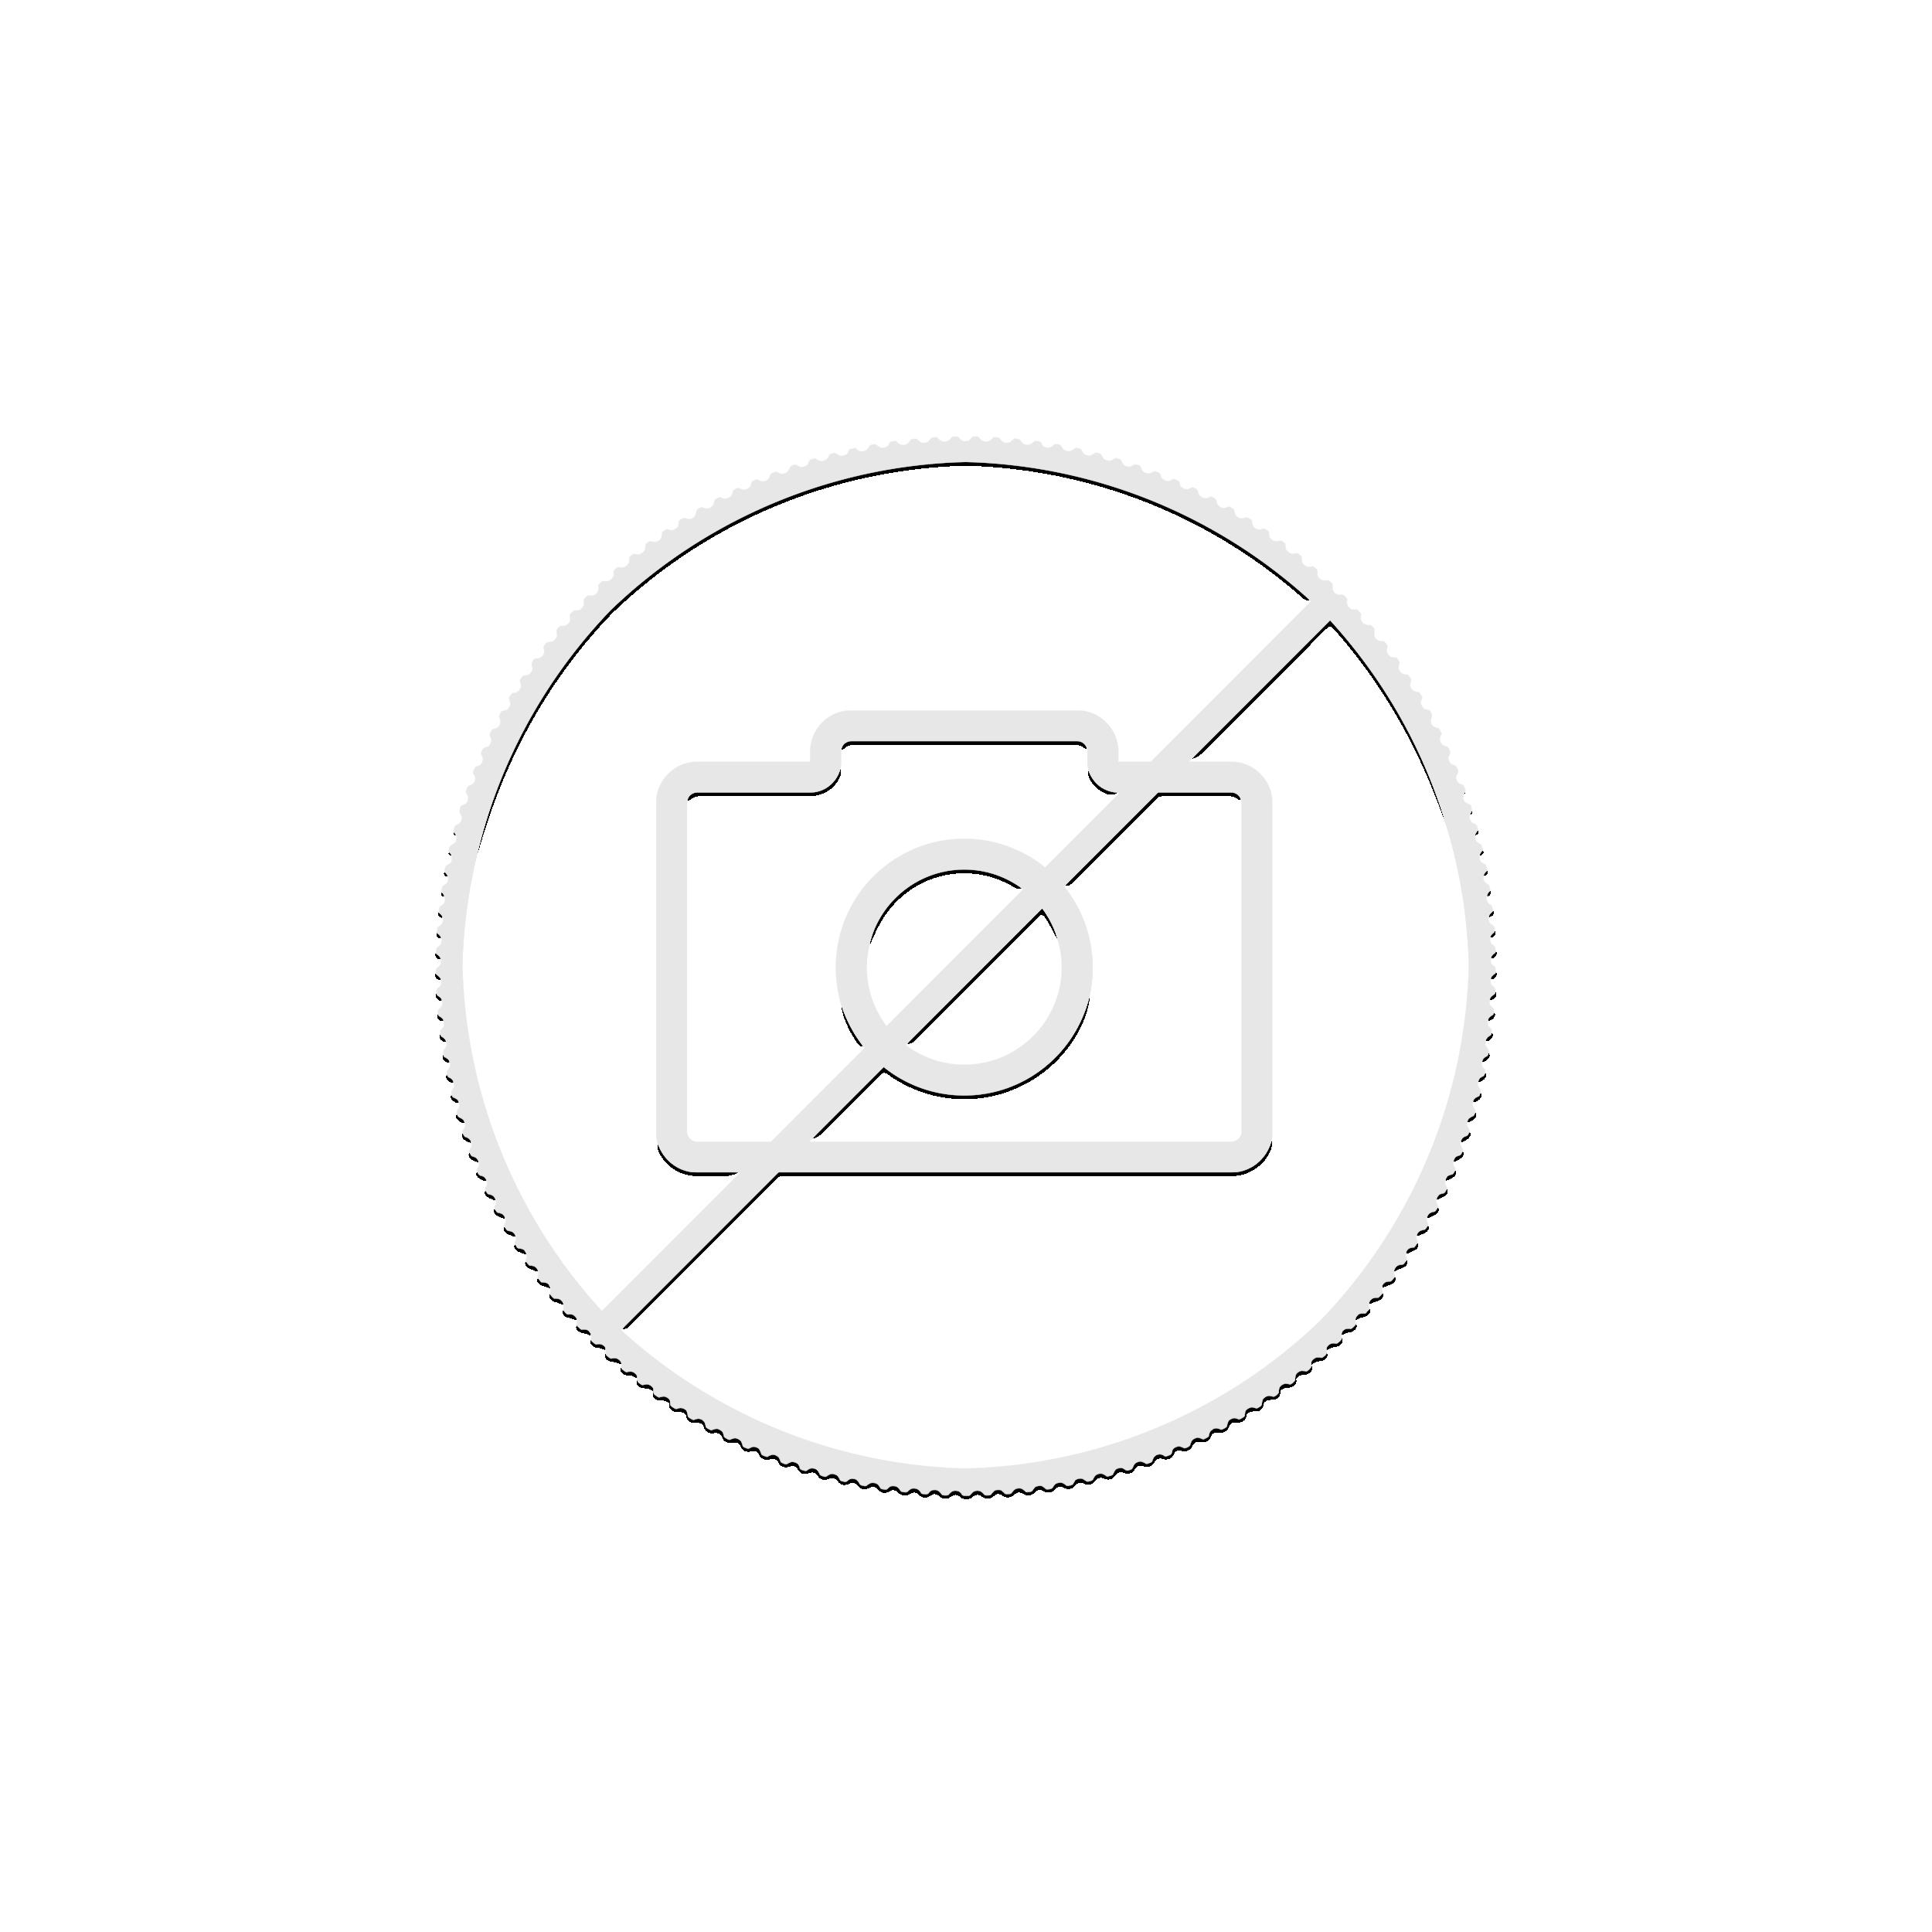 2 troy ounce silver coin Ascension of Sleipnir 2021